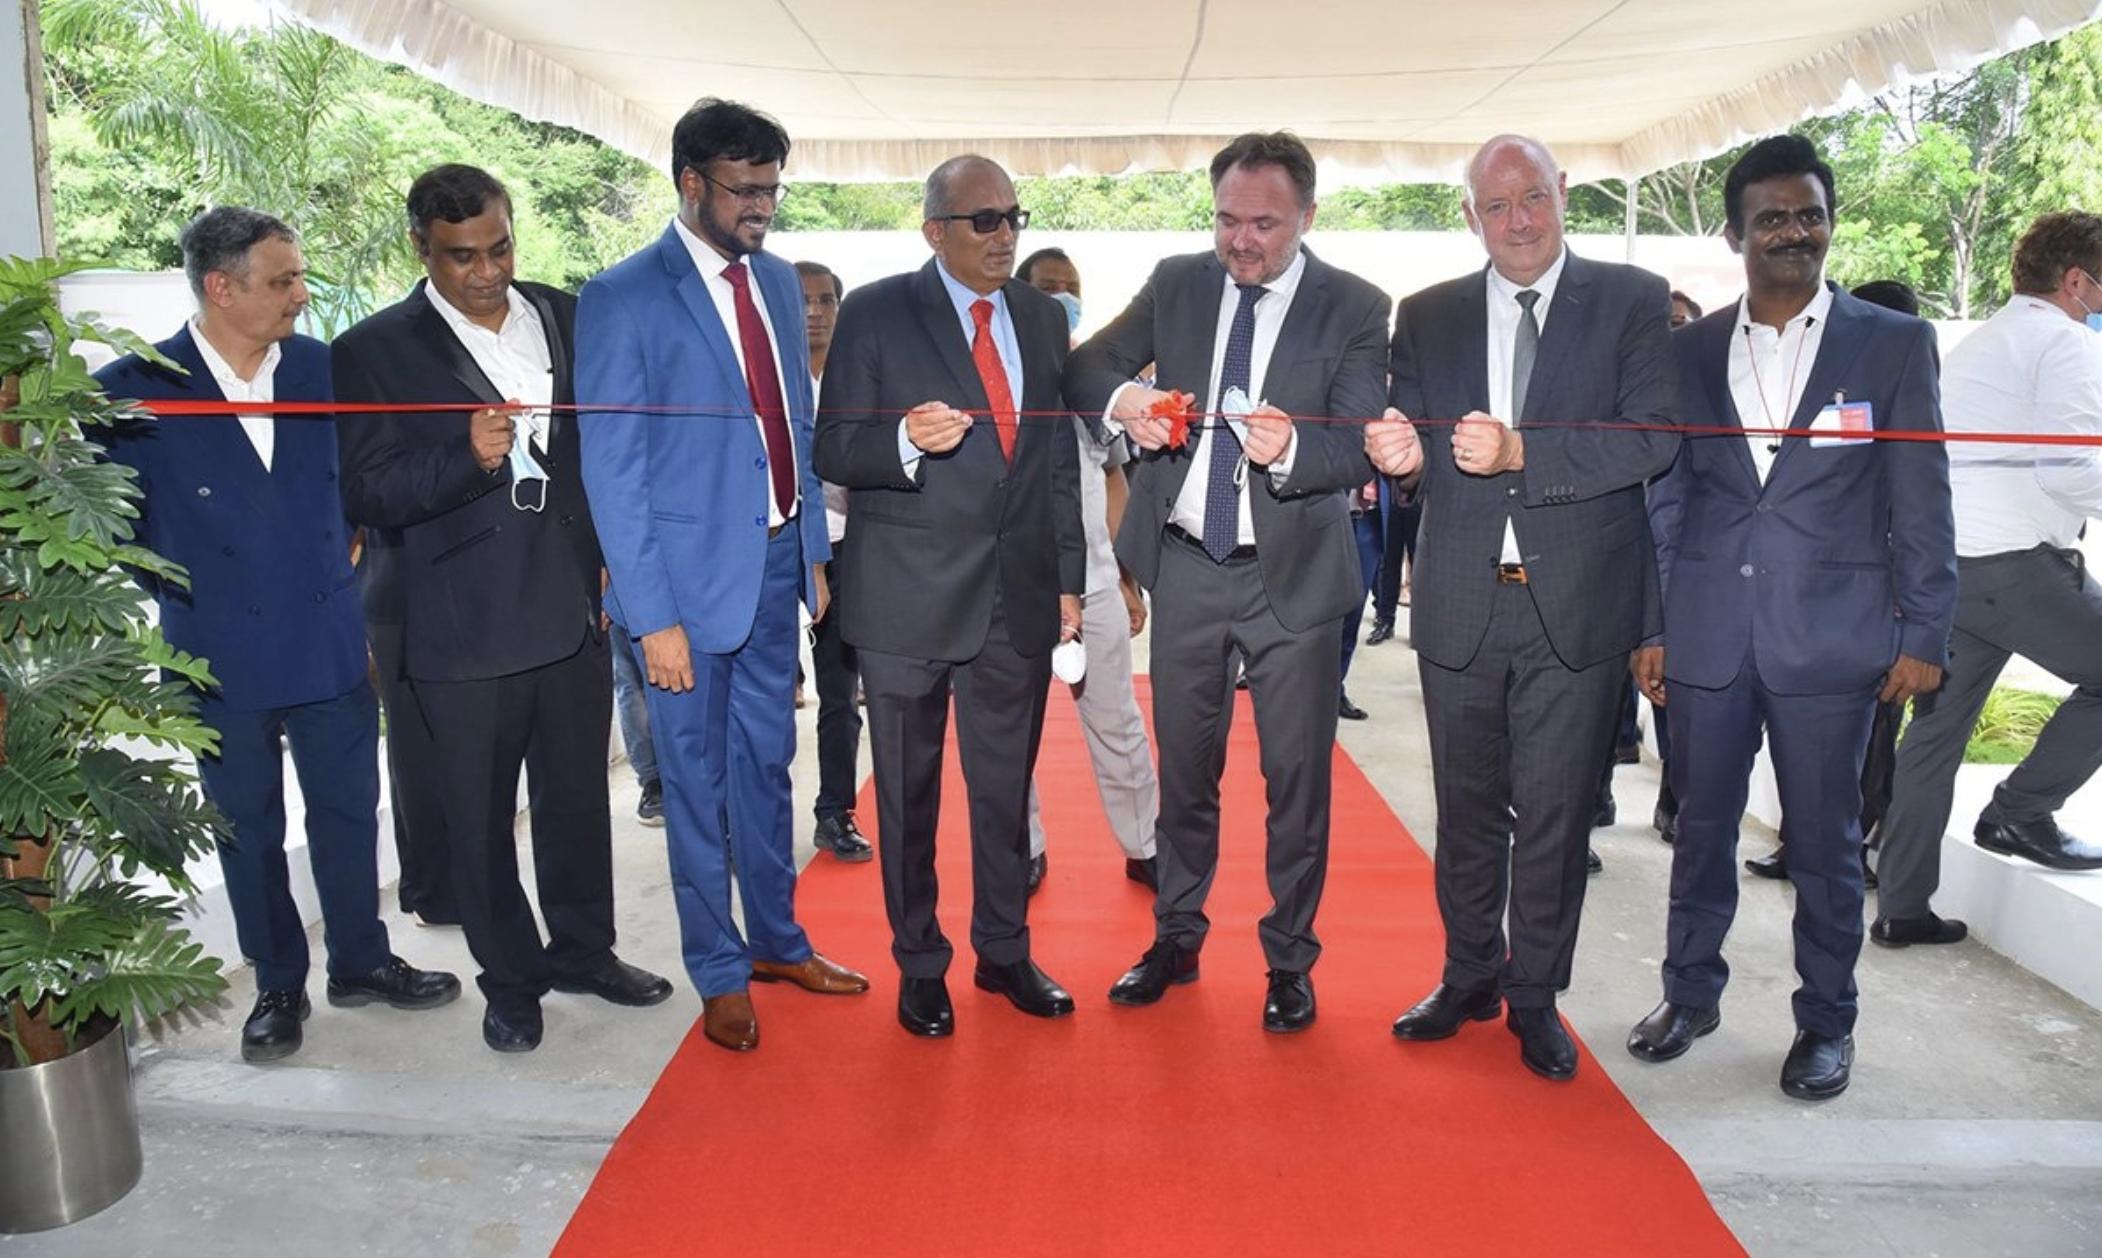 Danfoss India社長のラビチャンドラン・プルショータマン氏(左から4人目)、デンマーク気候・エネルギー・公益事業大臣のダン・ヨルゲンセン氏(右から3人目)、駐インドデンマーク大使のフレディ・スヴァーネ氏(右から2人目)